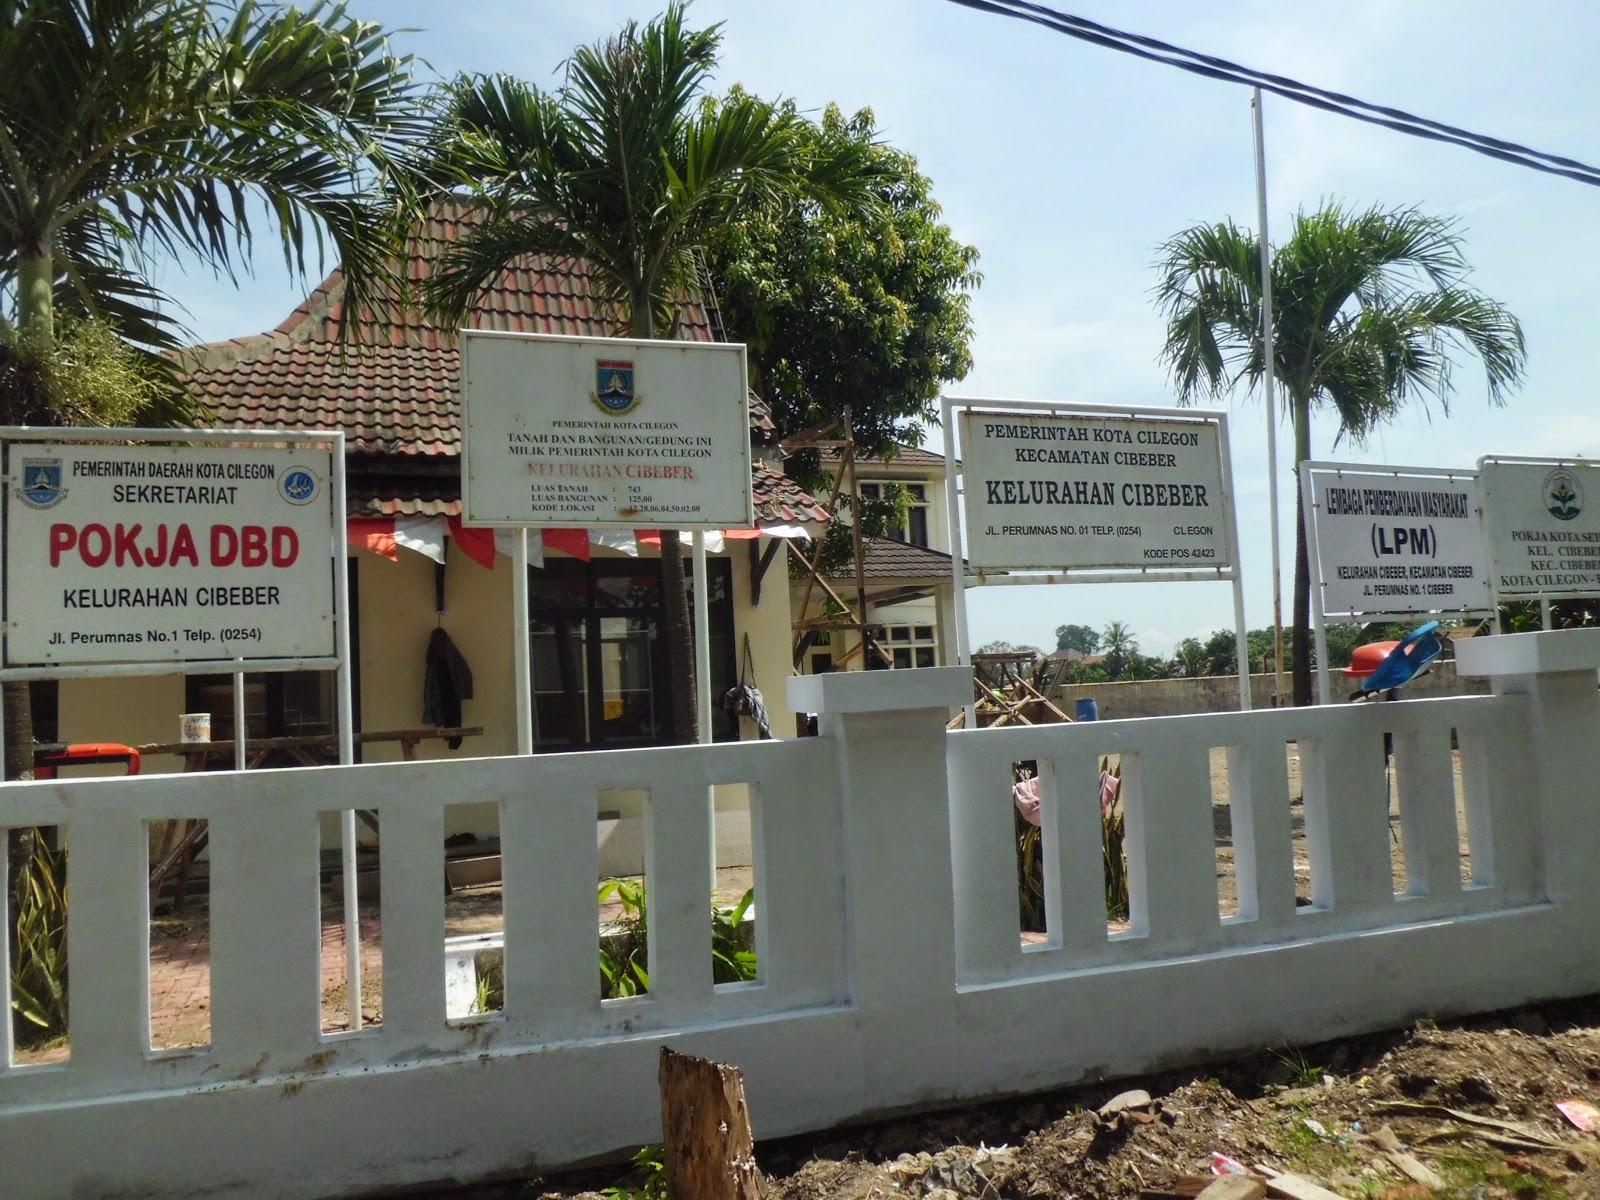 kantor kelurahan cibeber